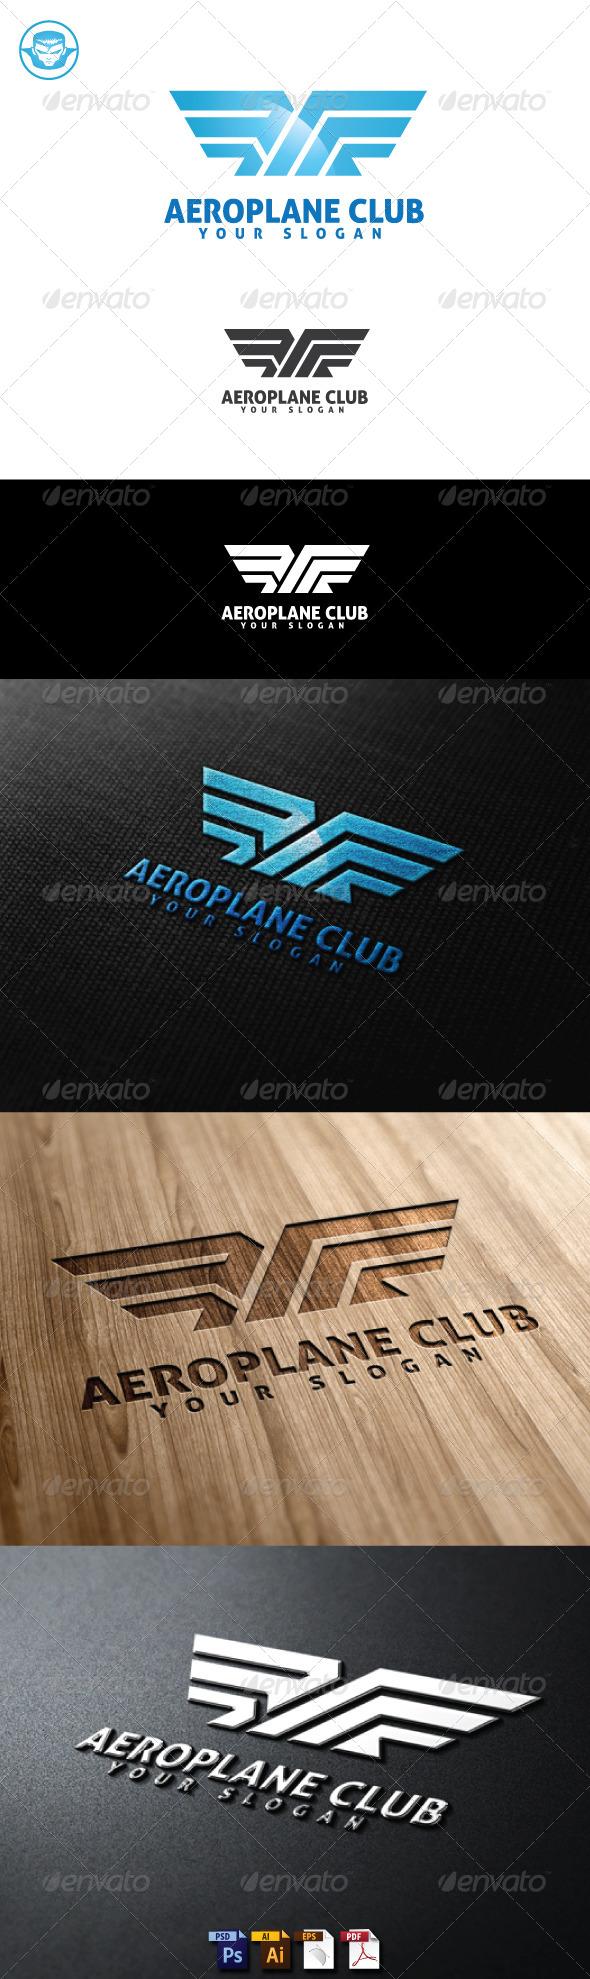 Aeroplane Club Logo Template